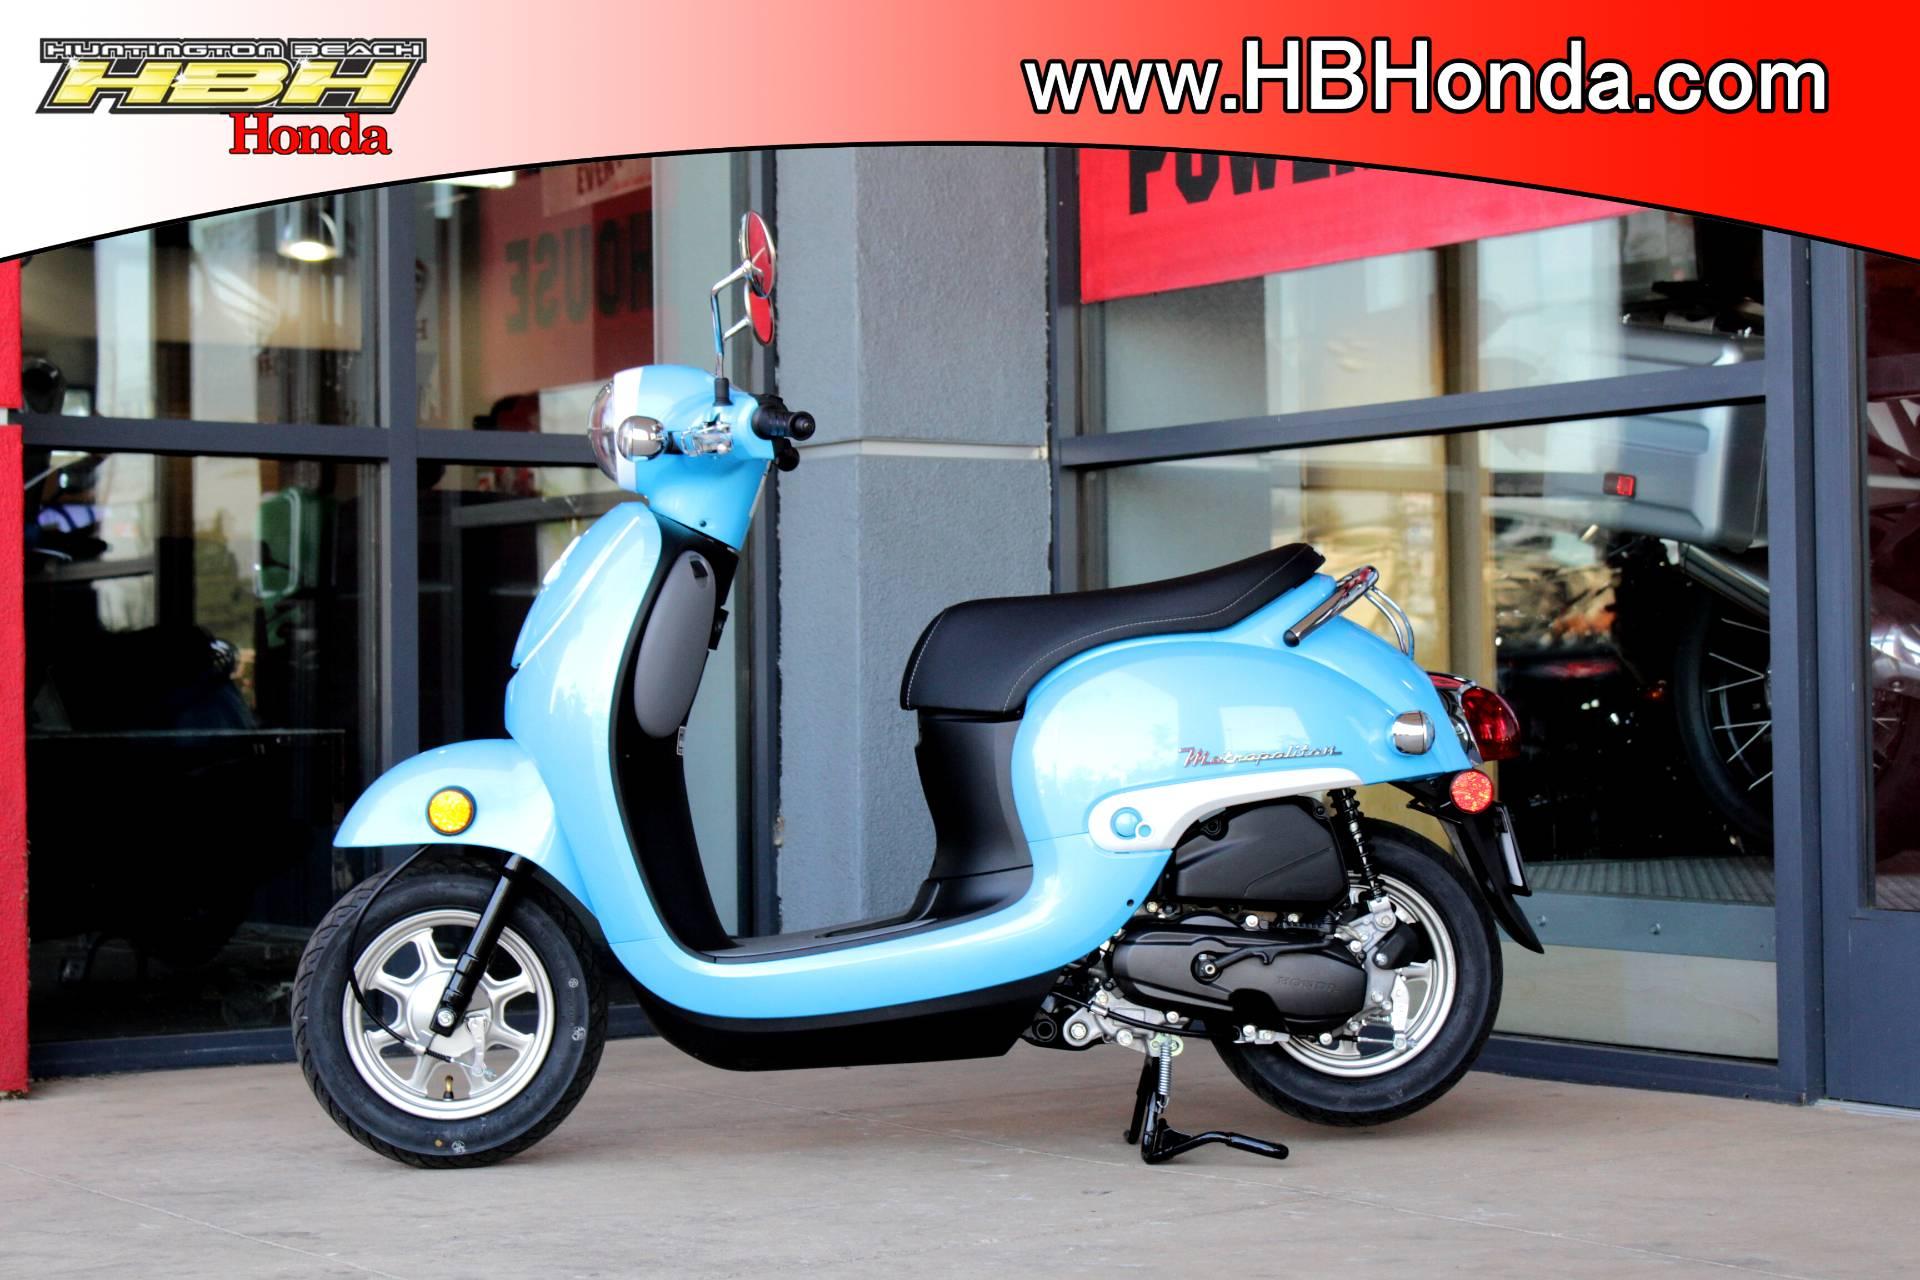 2017 Honda Metropolitan In Huntington Beach California